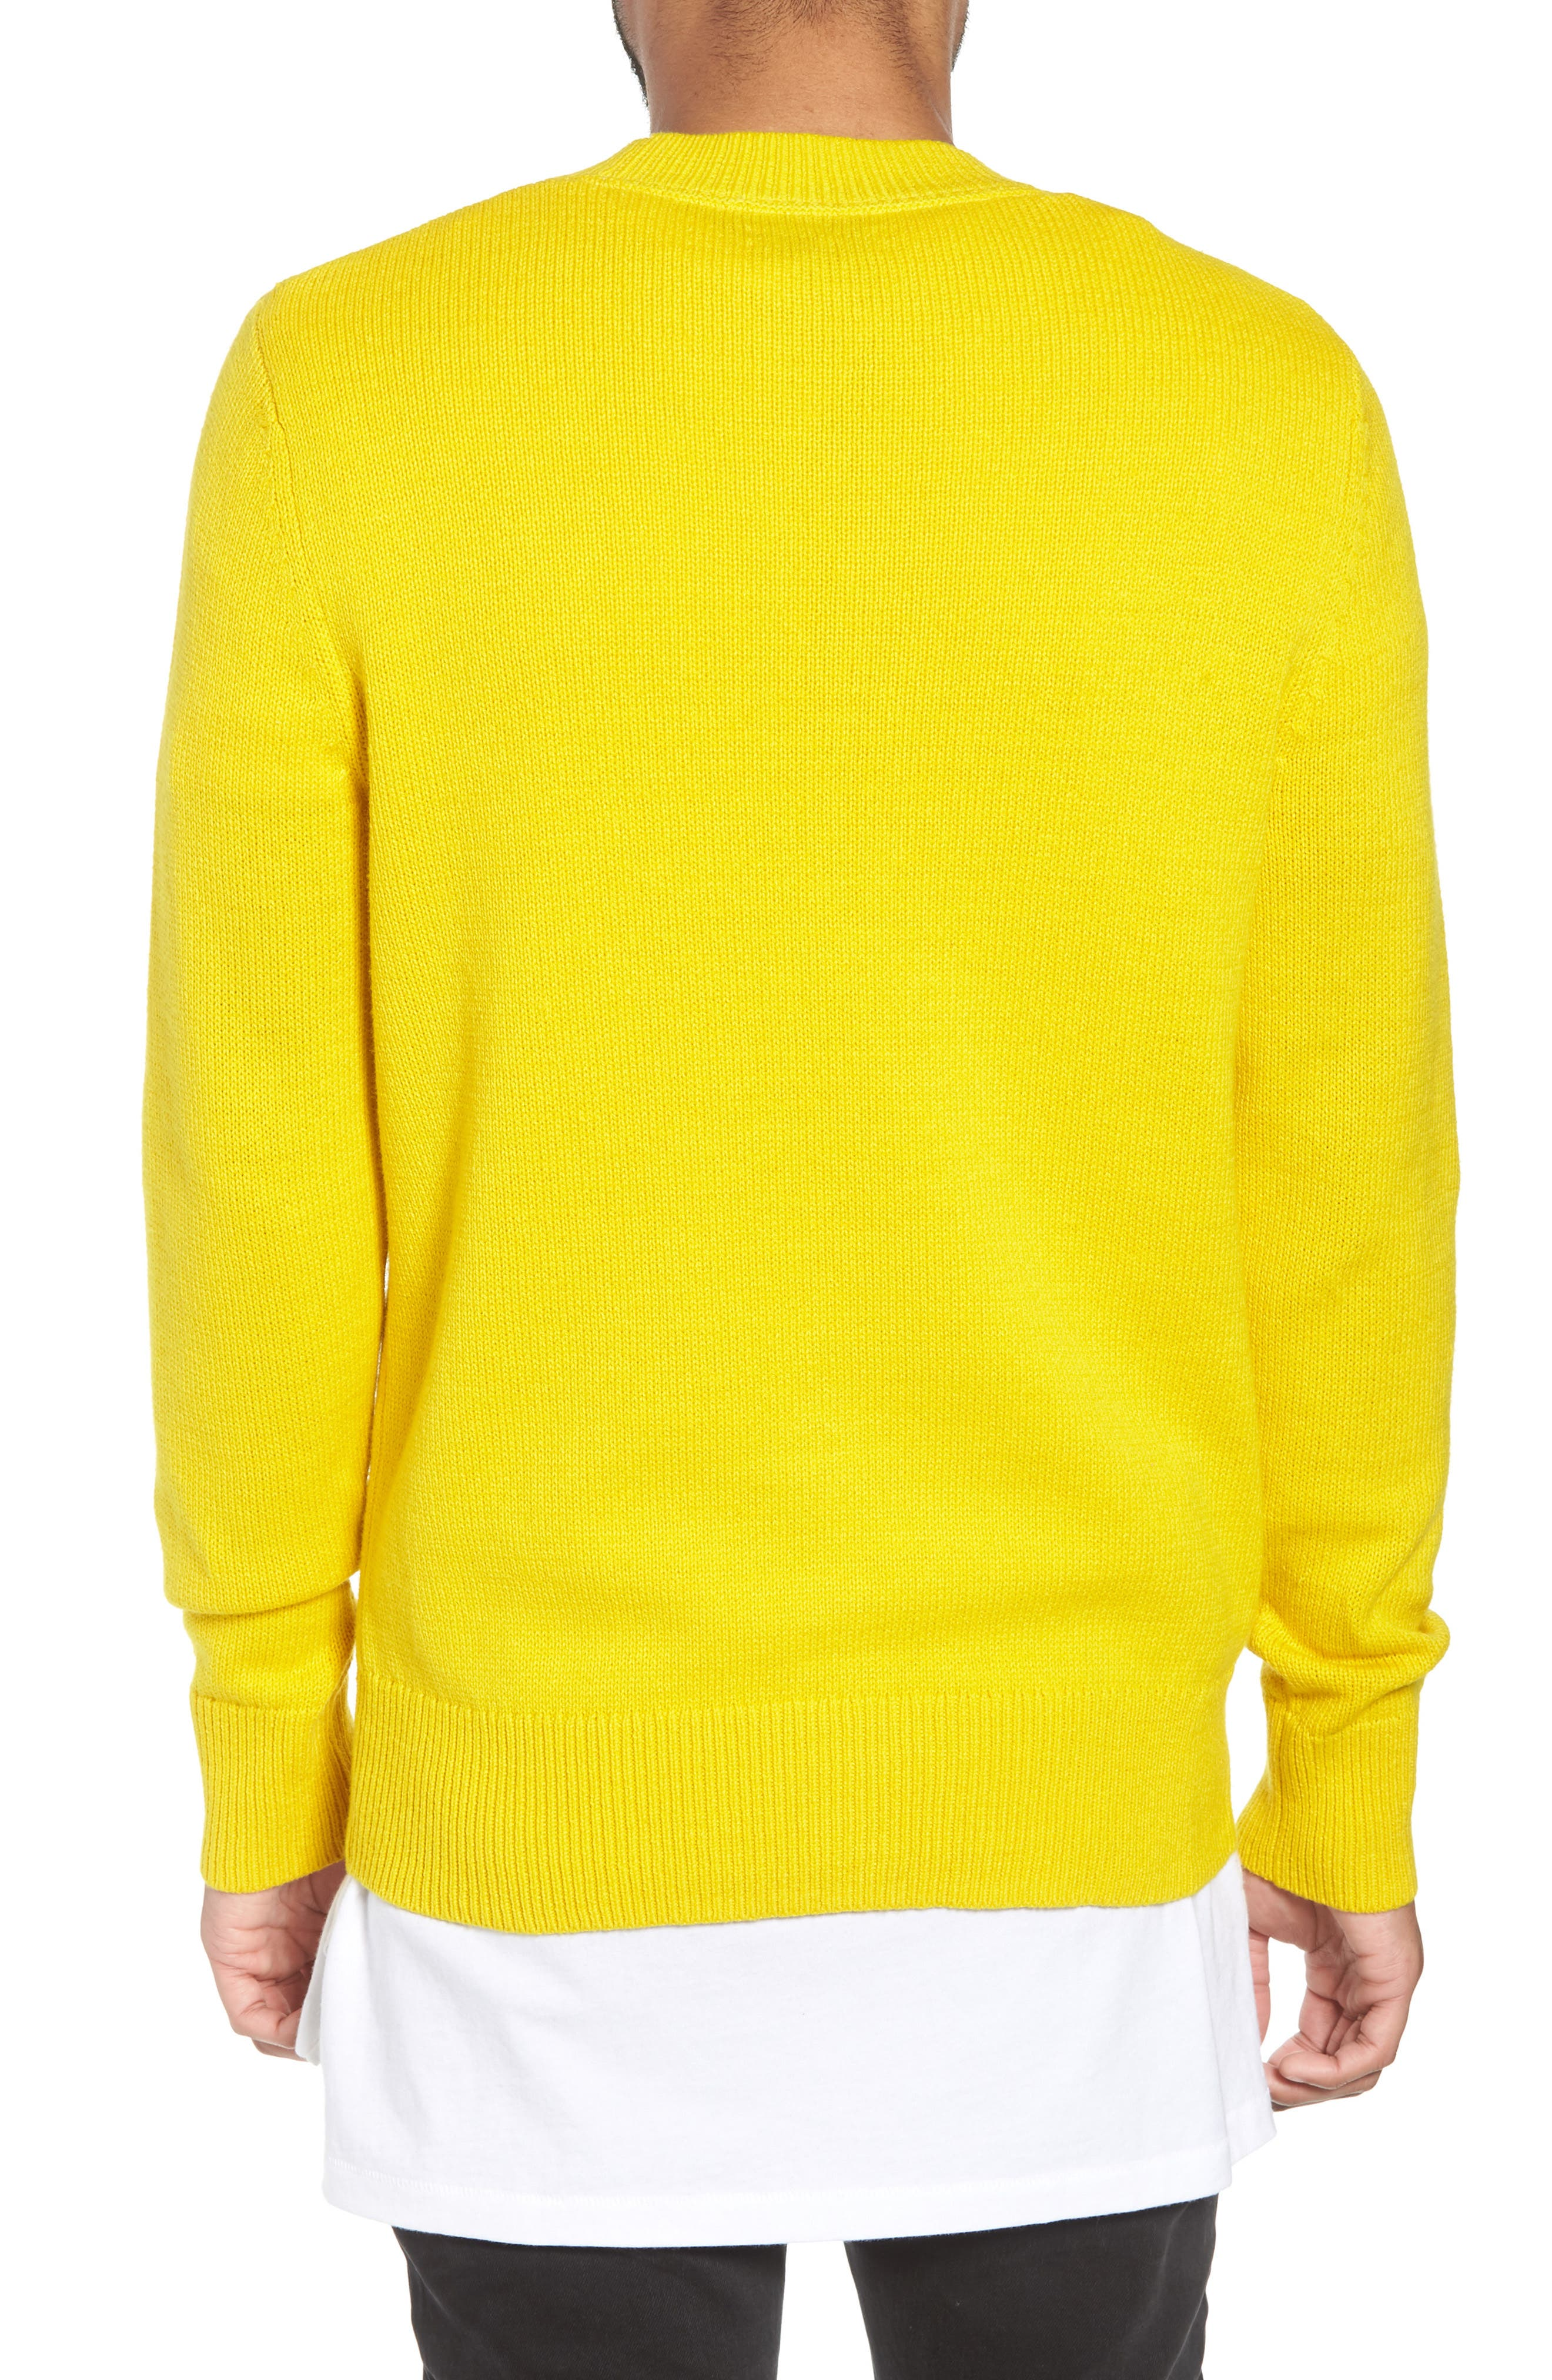 Crewneck Sweater,                             Alternate thumbnail 2, color,                             YELLOW SULPHUR